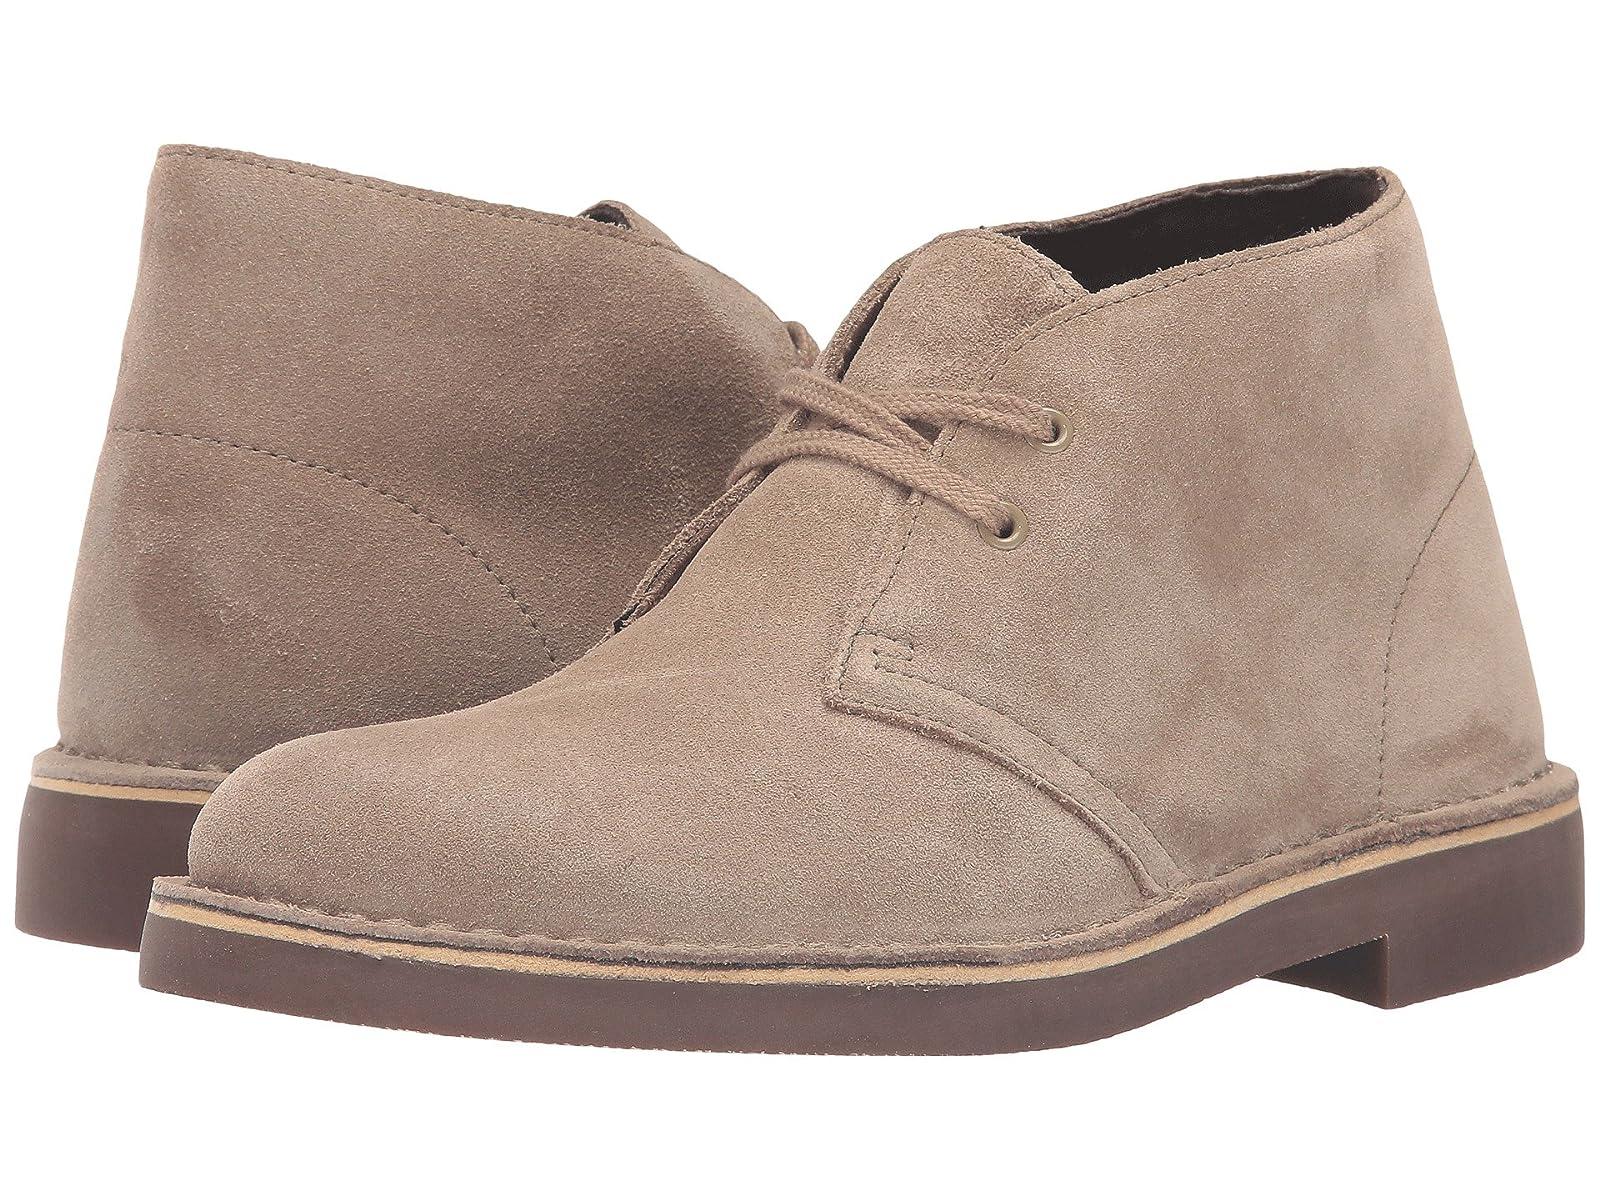 Clarks Acre BridgeCheap and distinctive eye-catching shoes